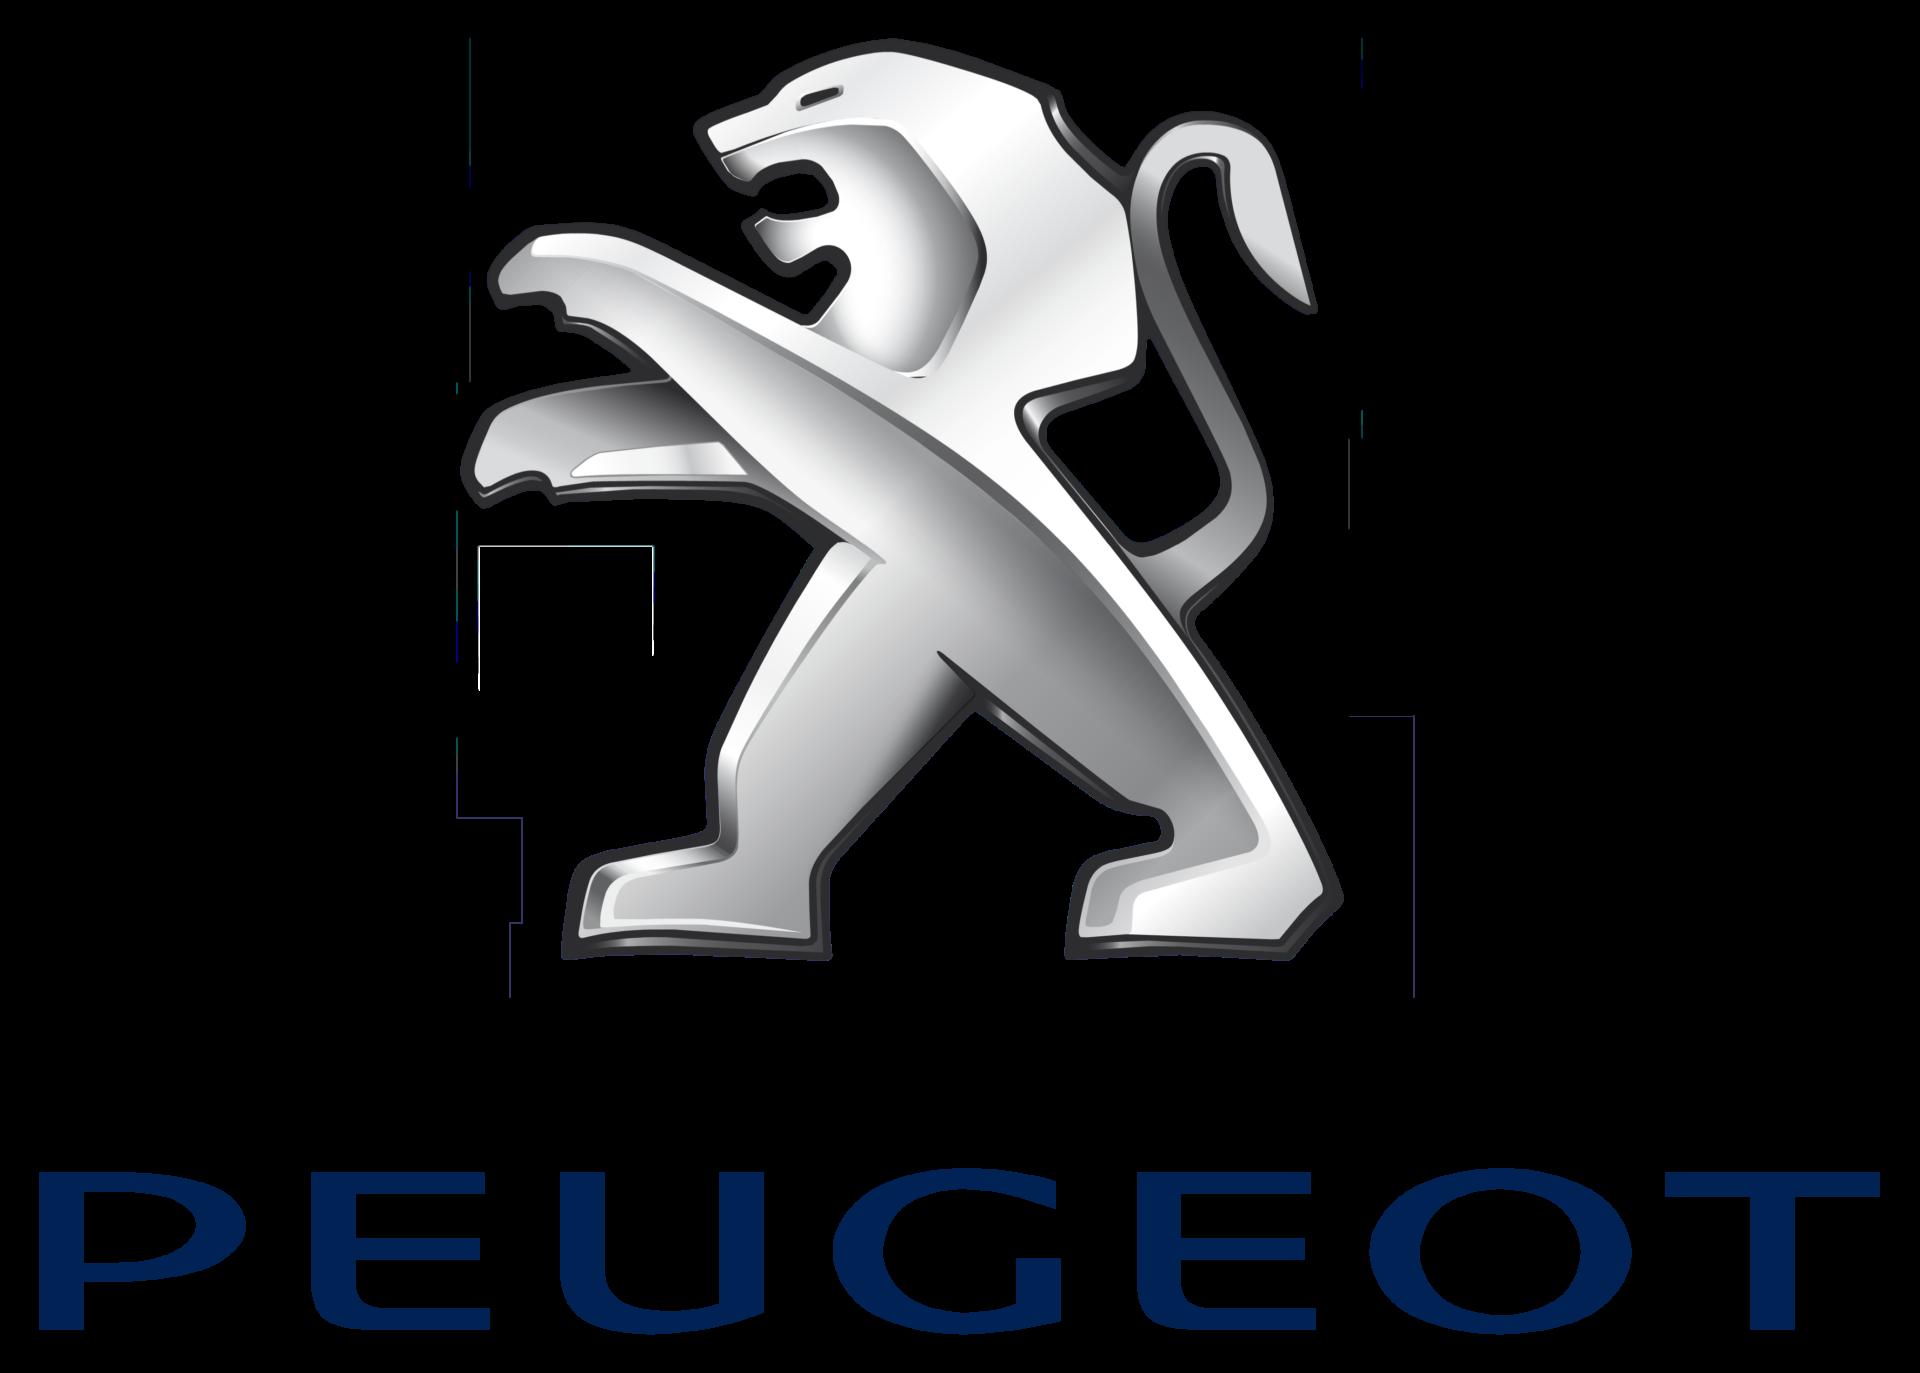 Pastiglie freno CL Peugeot